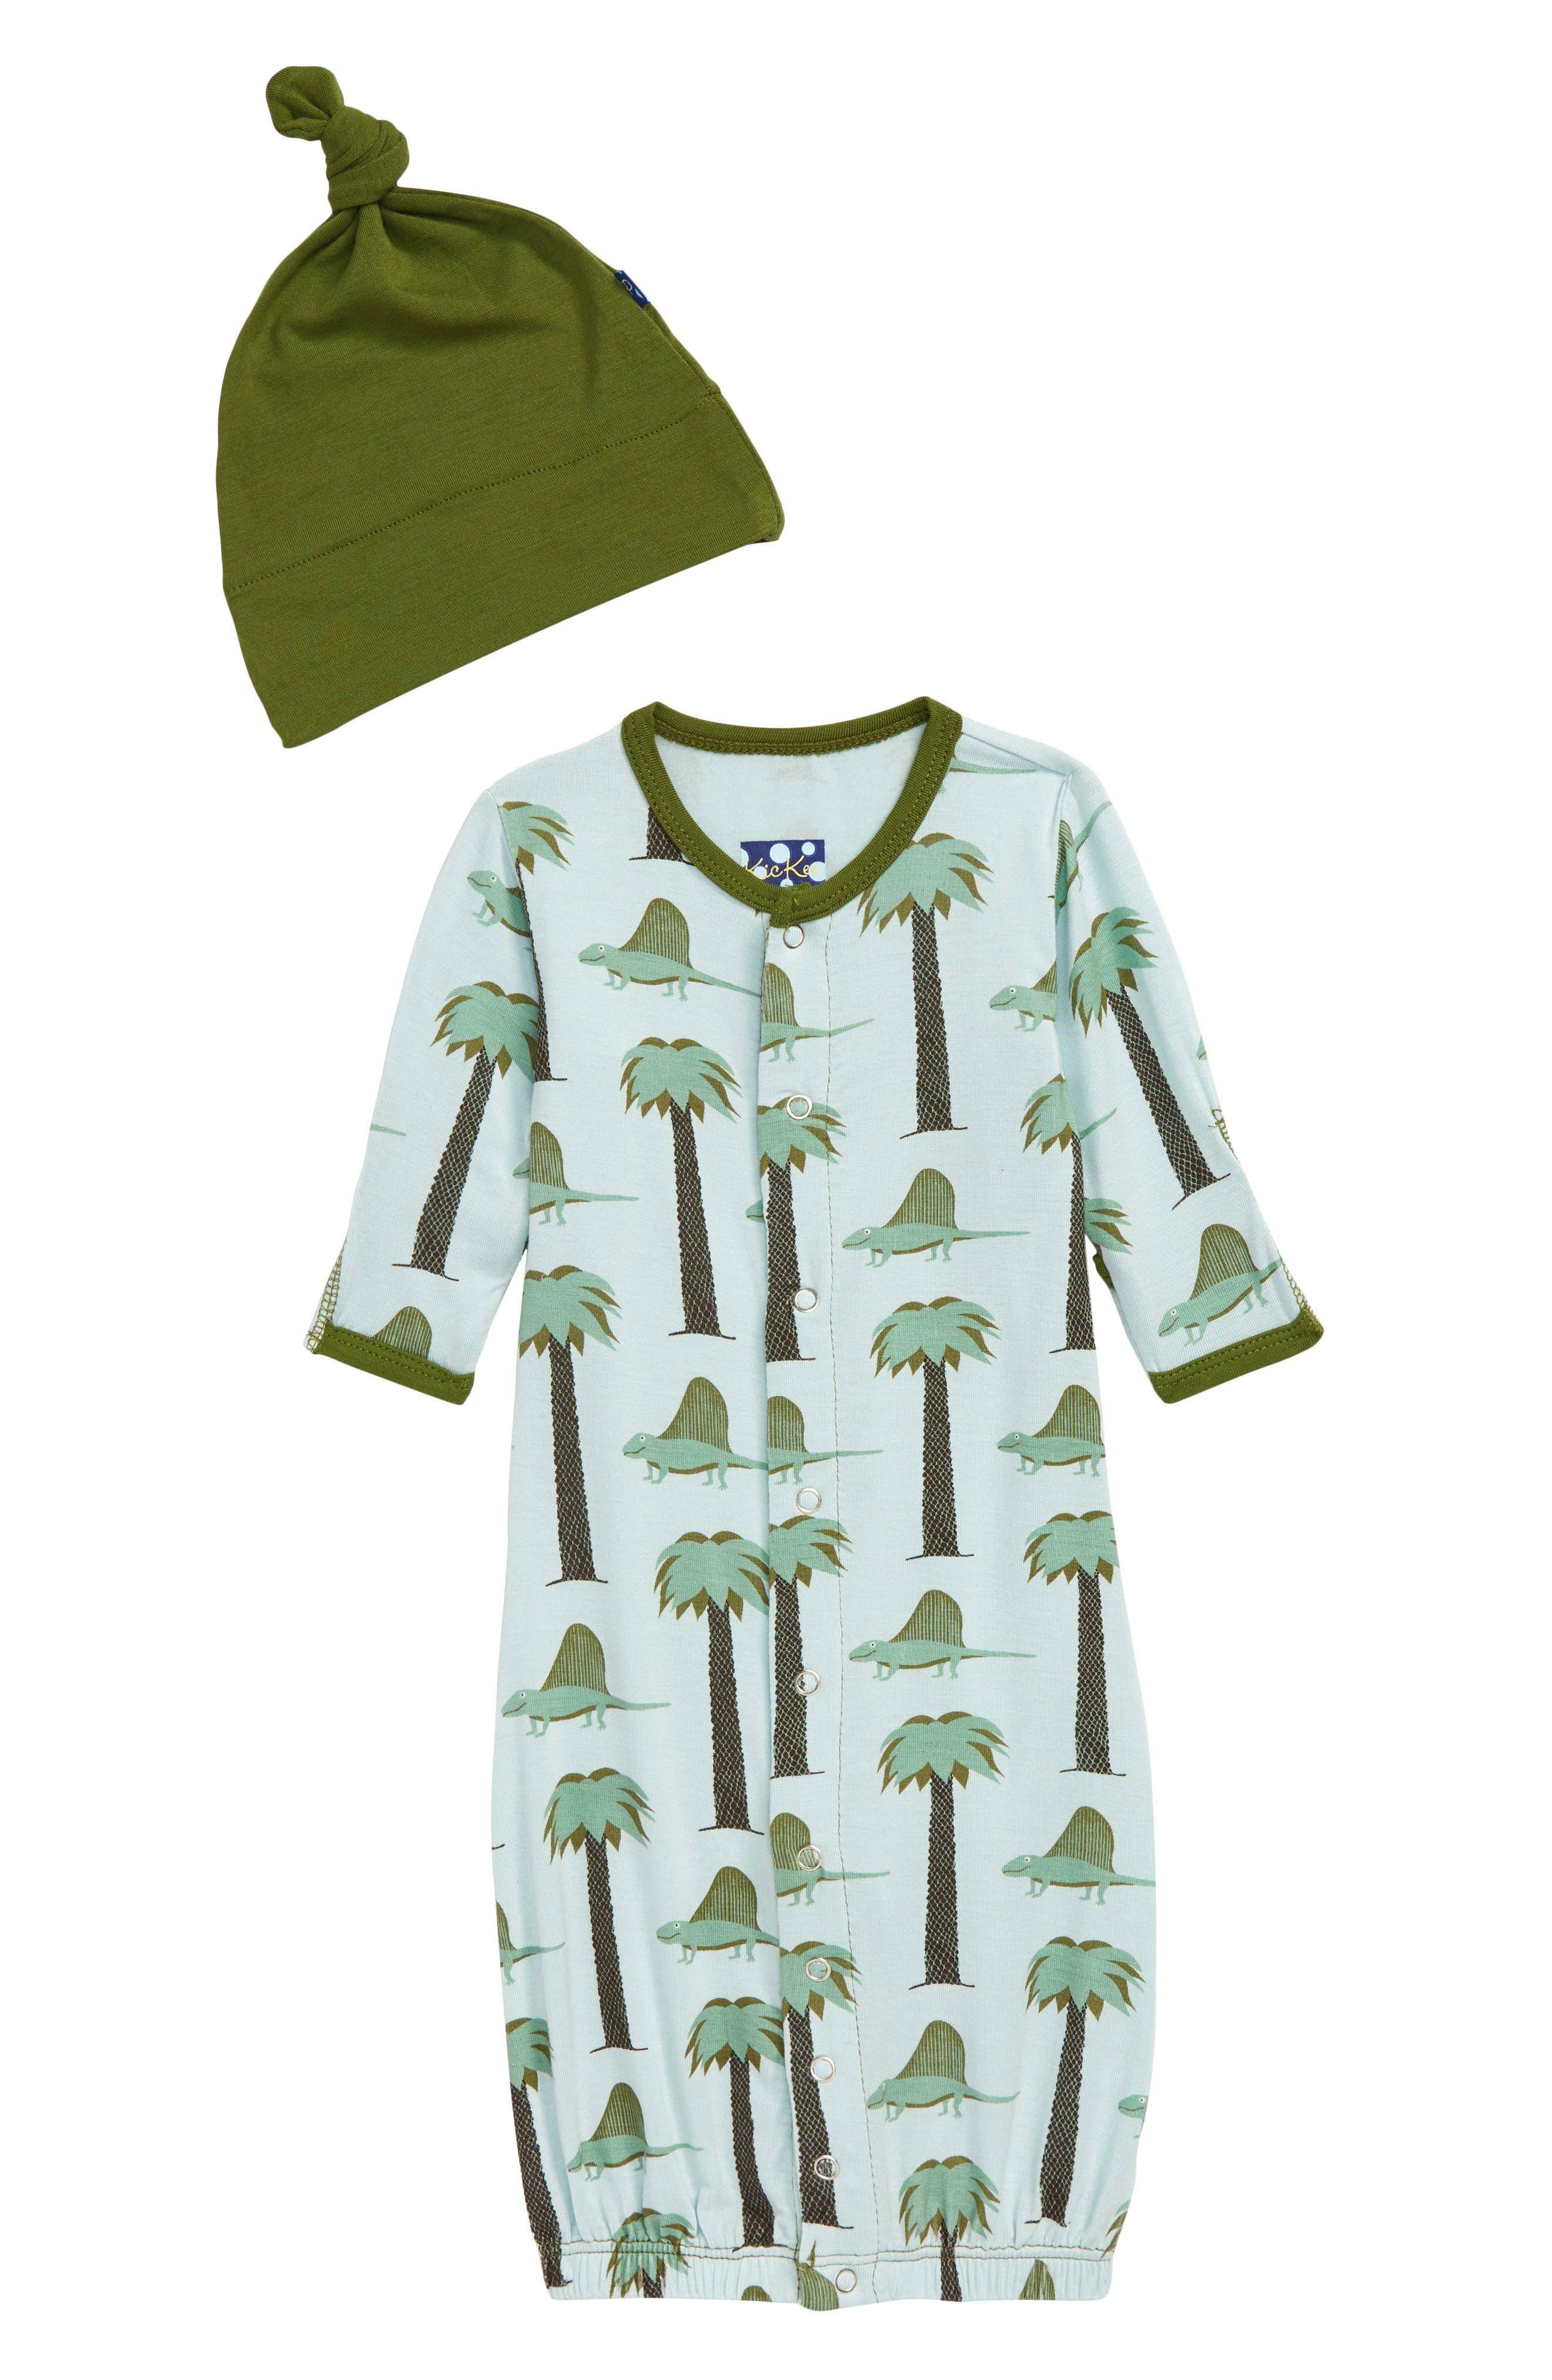 Infant Boys Kickee Pants Convertible Gown  Hat Set Size 36M  Blue